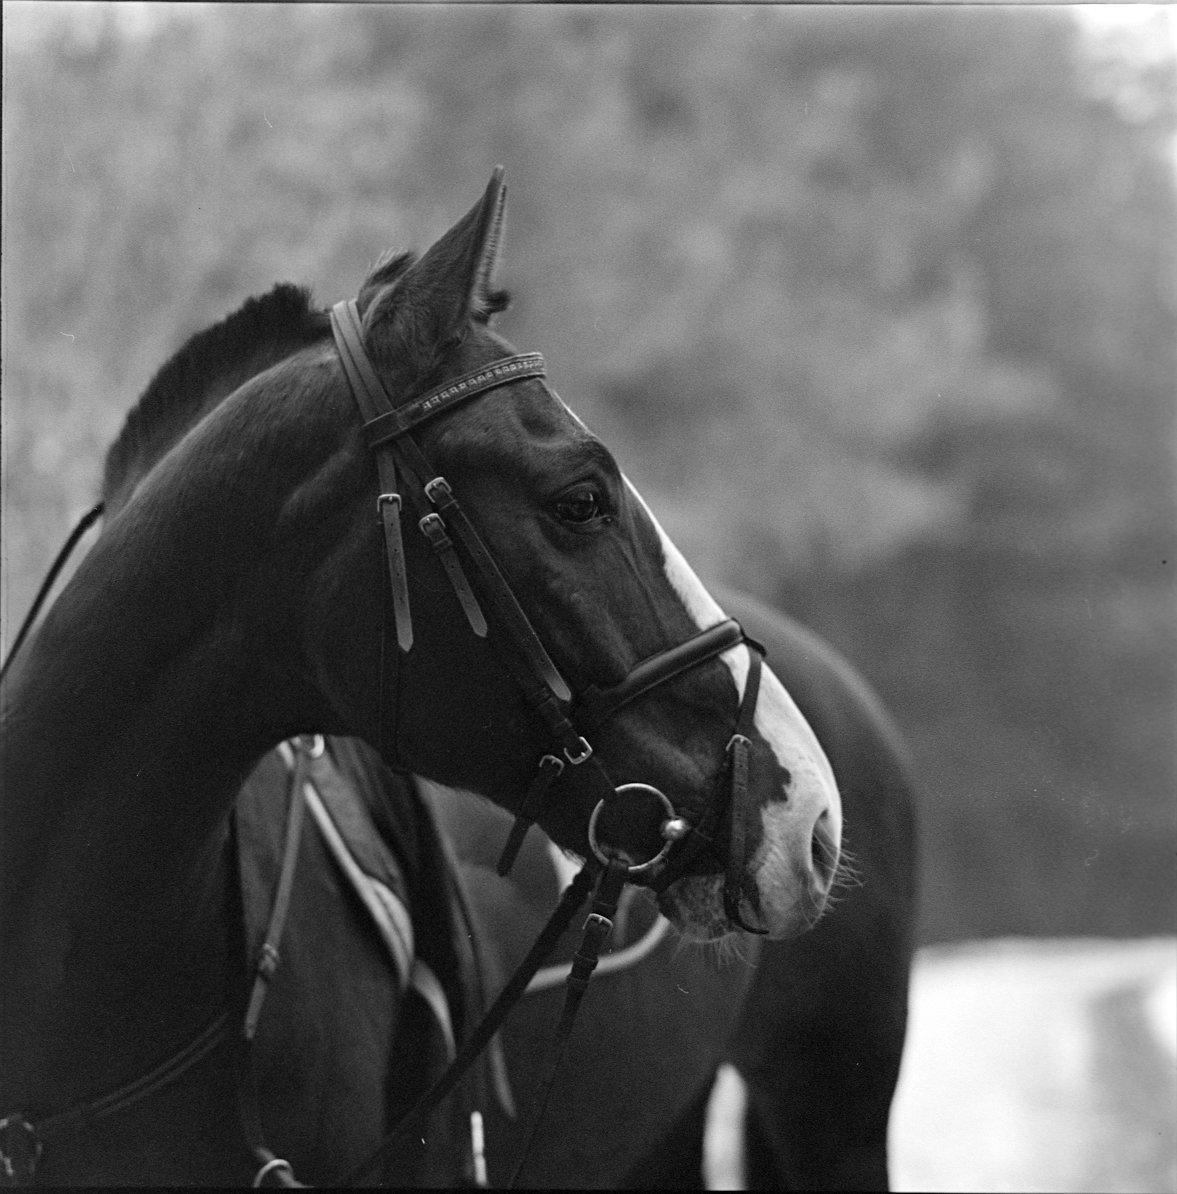 , hasselblad, Kodak, конь, пленка, Средний формат, Ч/б, Самойлов Алексей